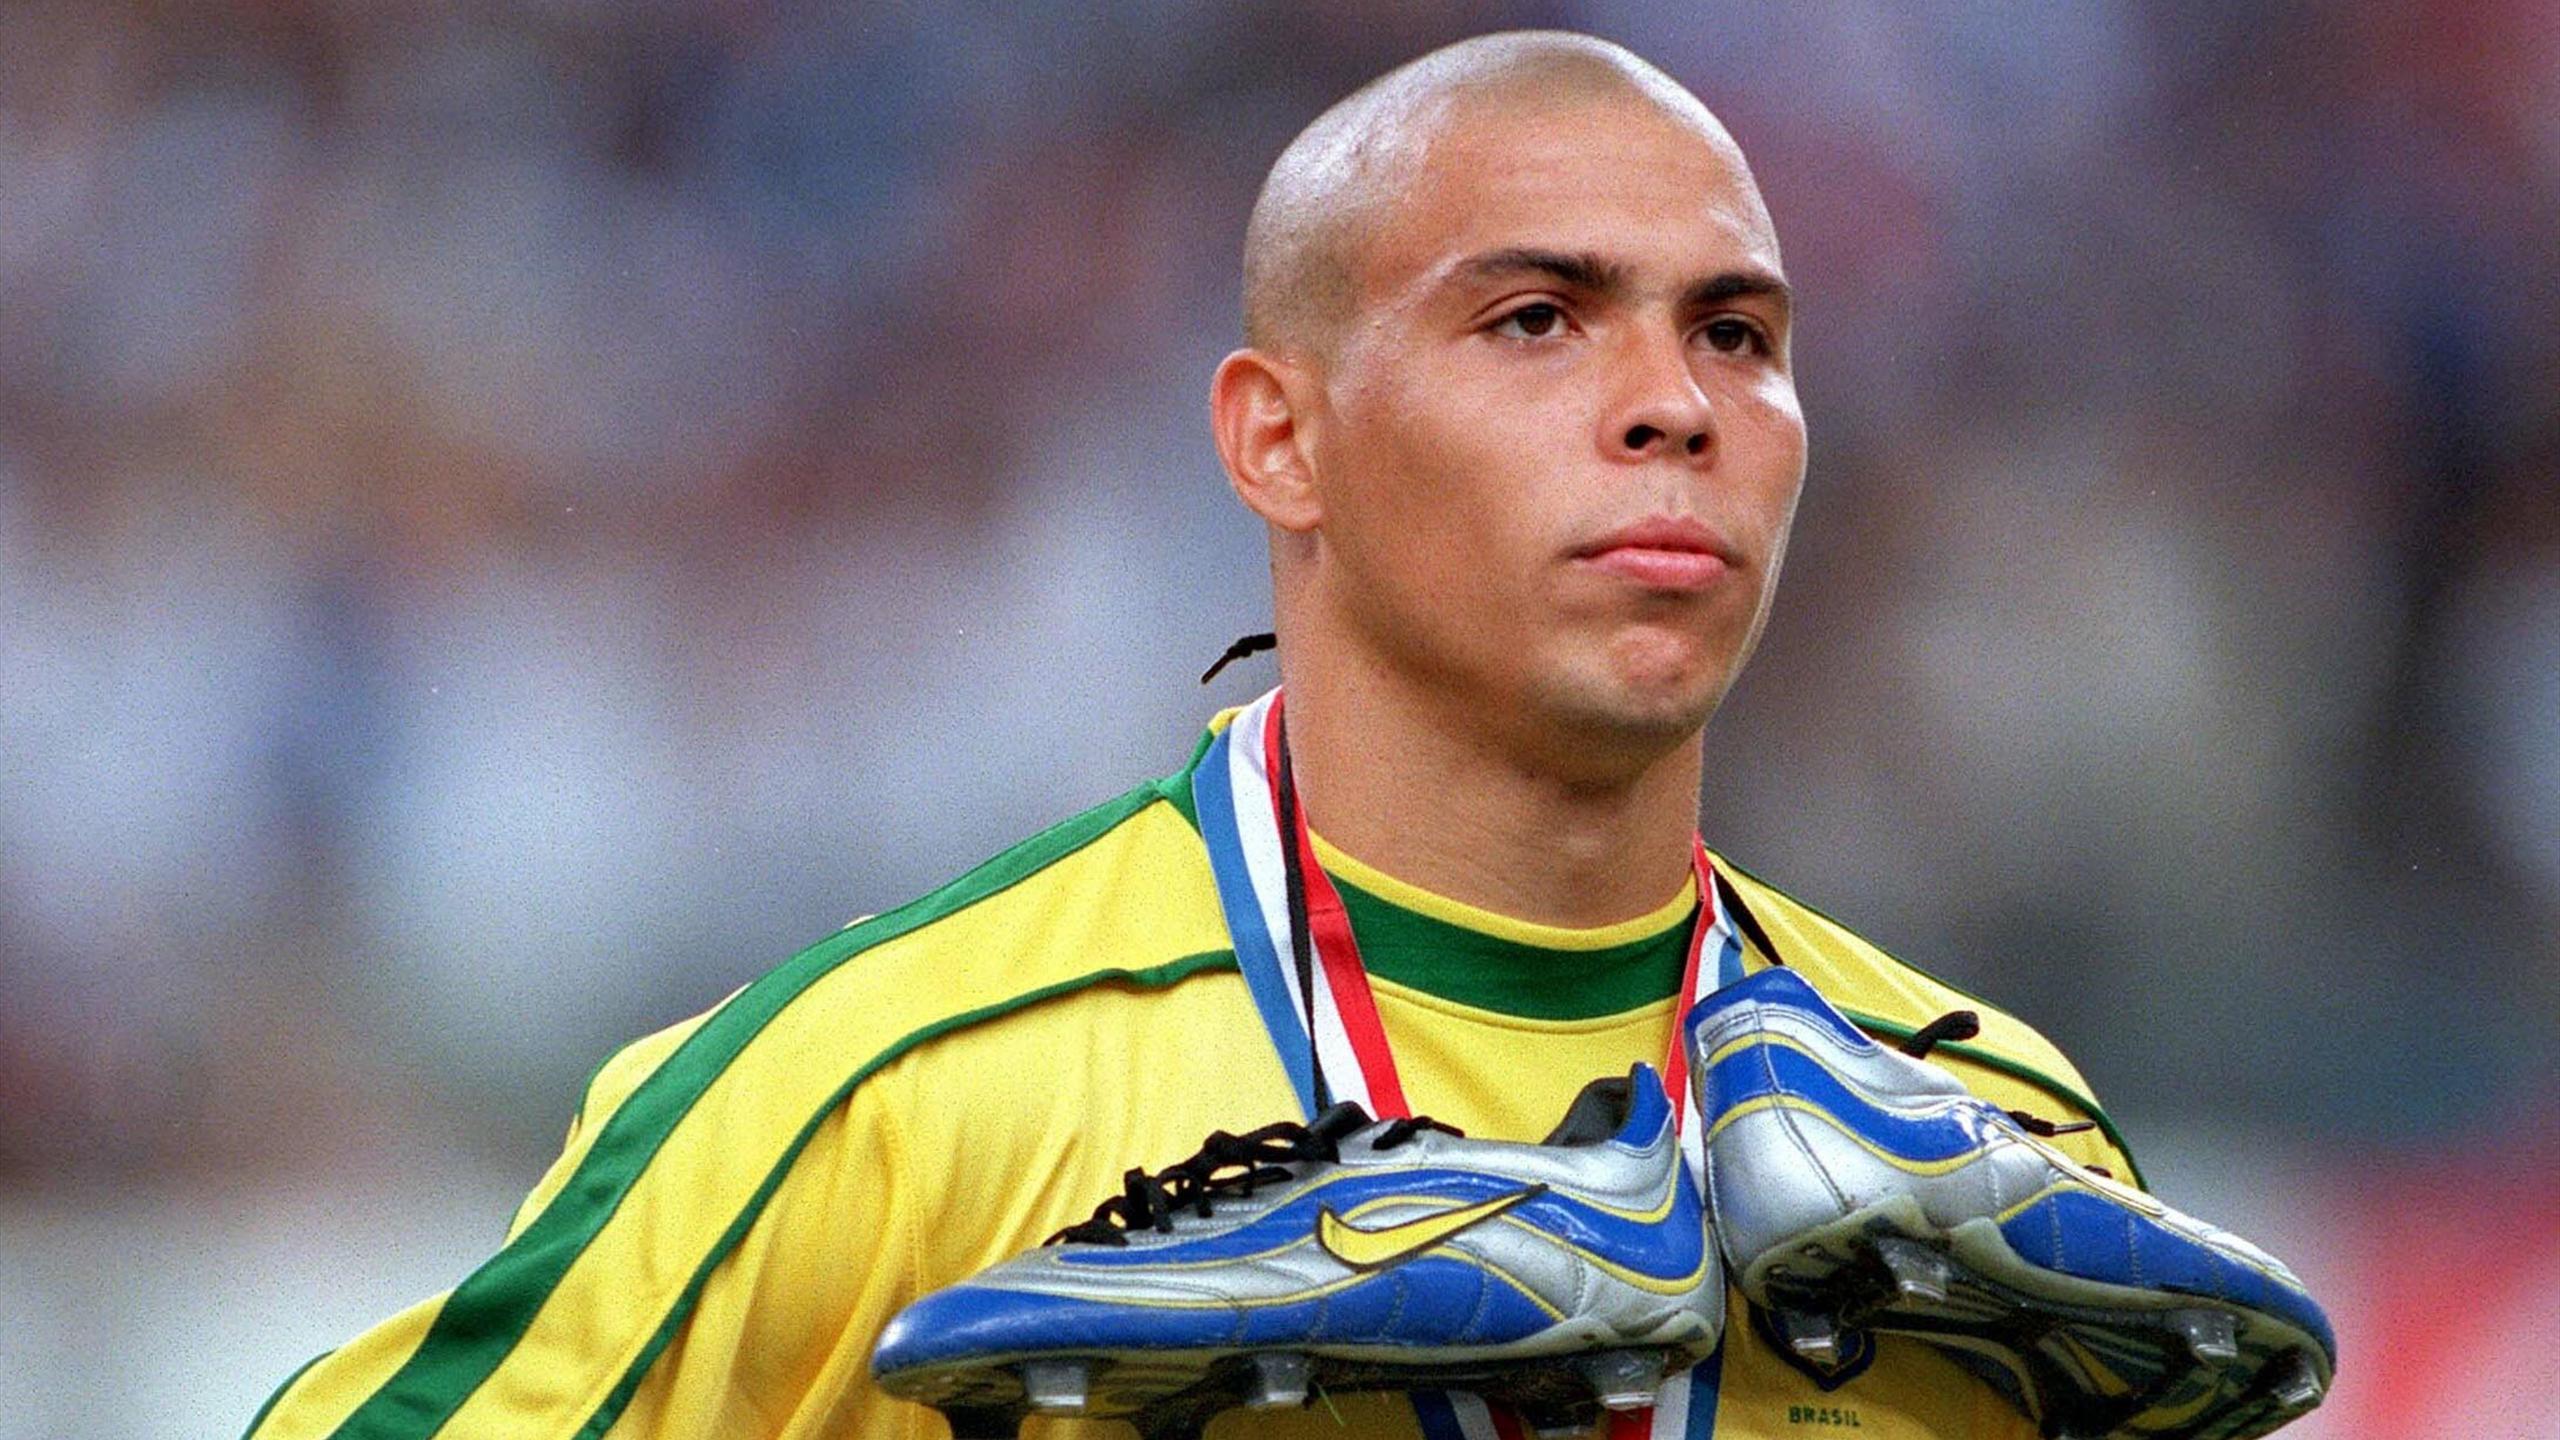 Adidas Copa Mundial, Nike Vapor, Umbro Speciali Elisez la